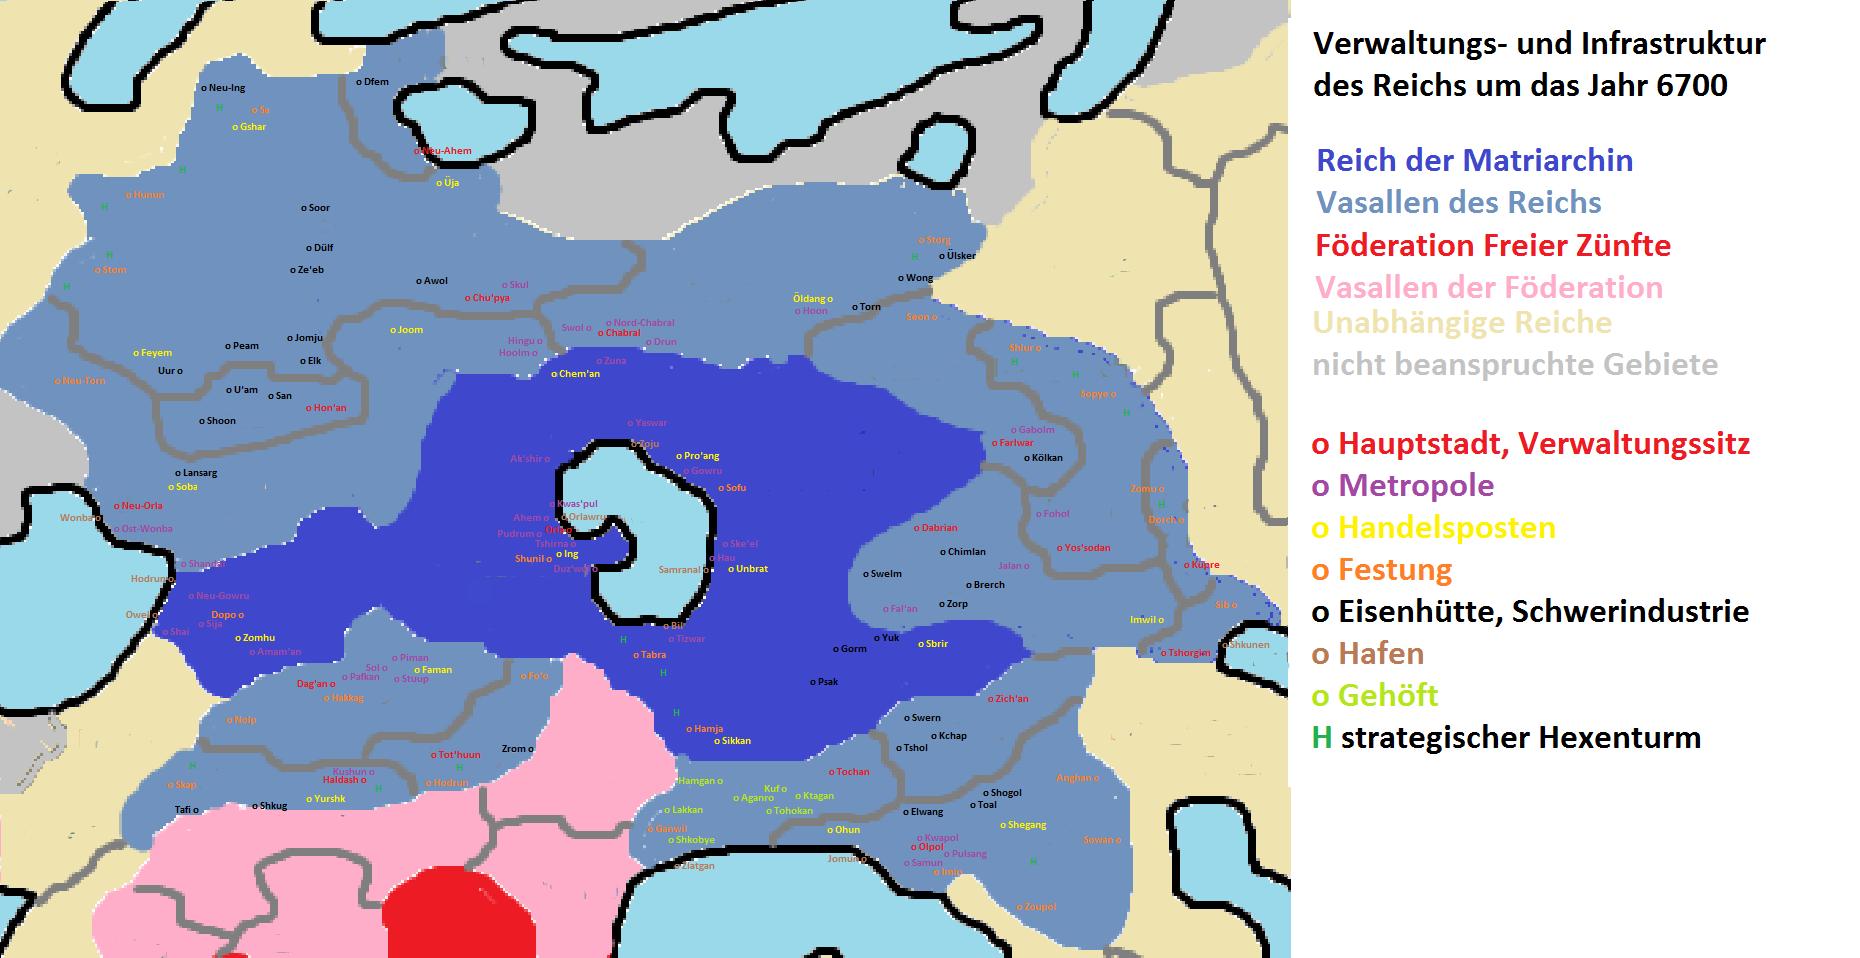 Eigene Welten - Seite 2 Eheb_empire_6700_citi6qkaz